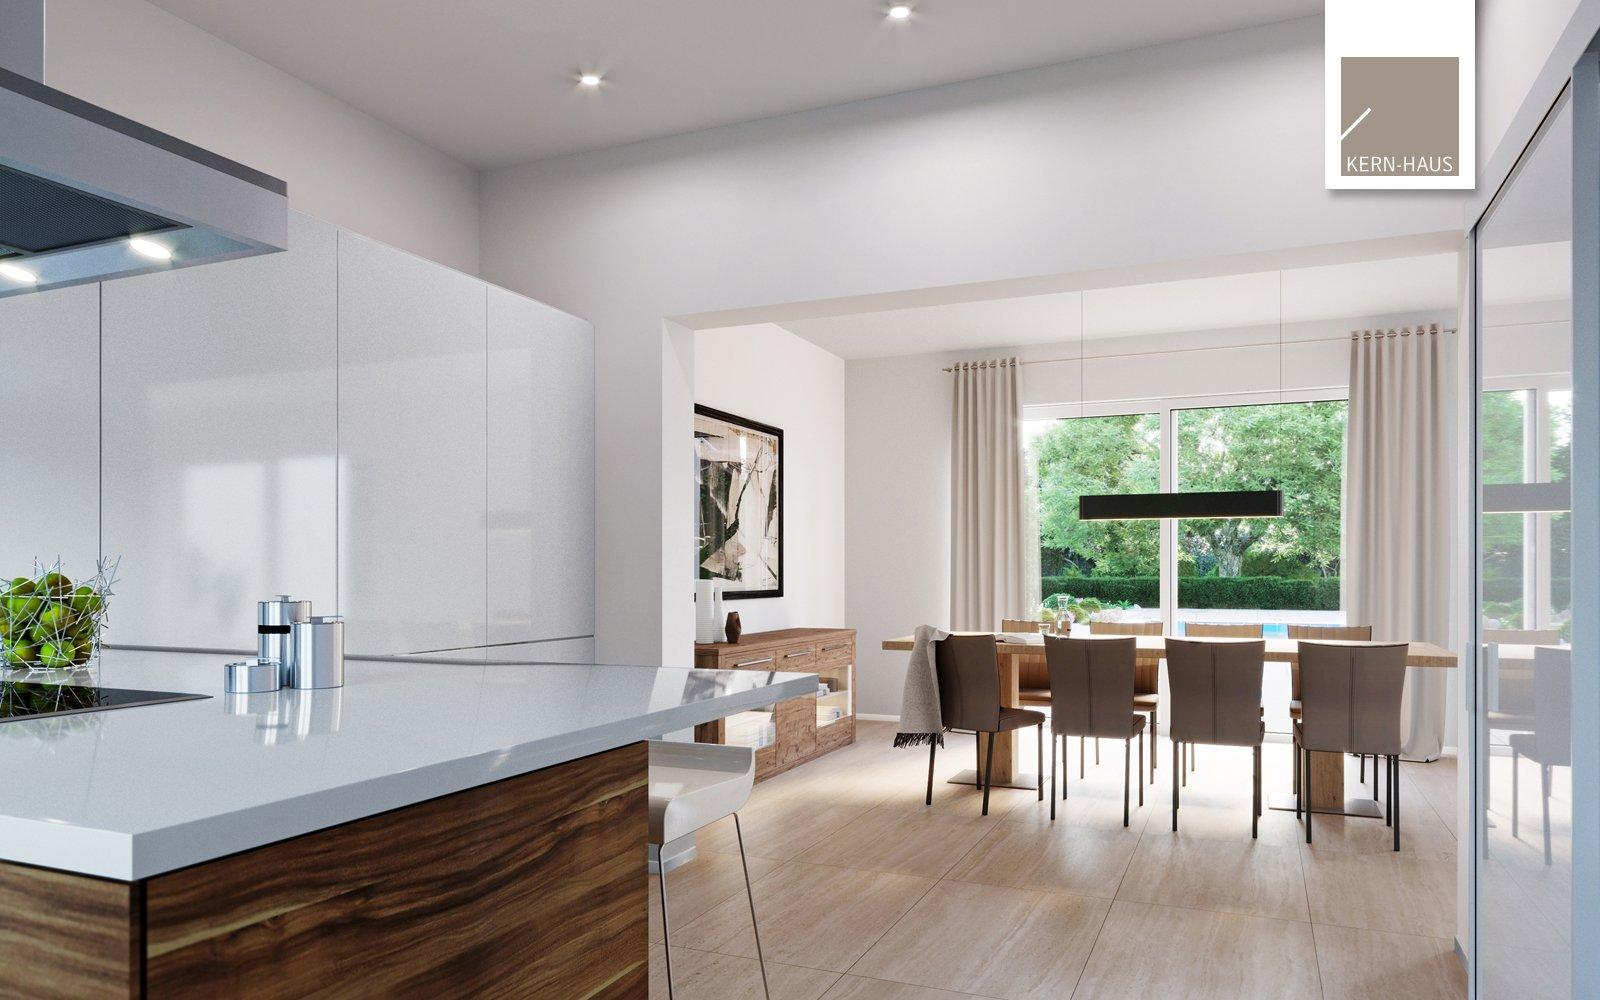 Kern-Haus Mehrfamilienhaus Vivaro Küche